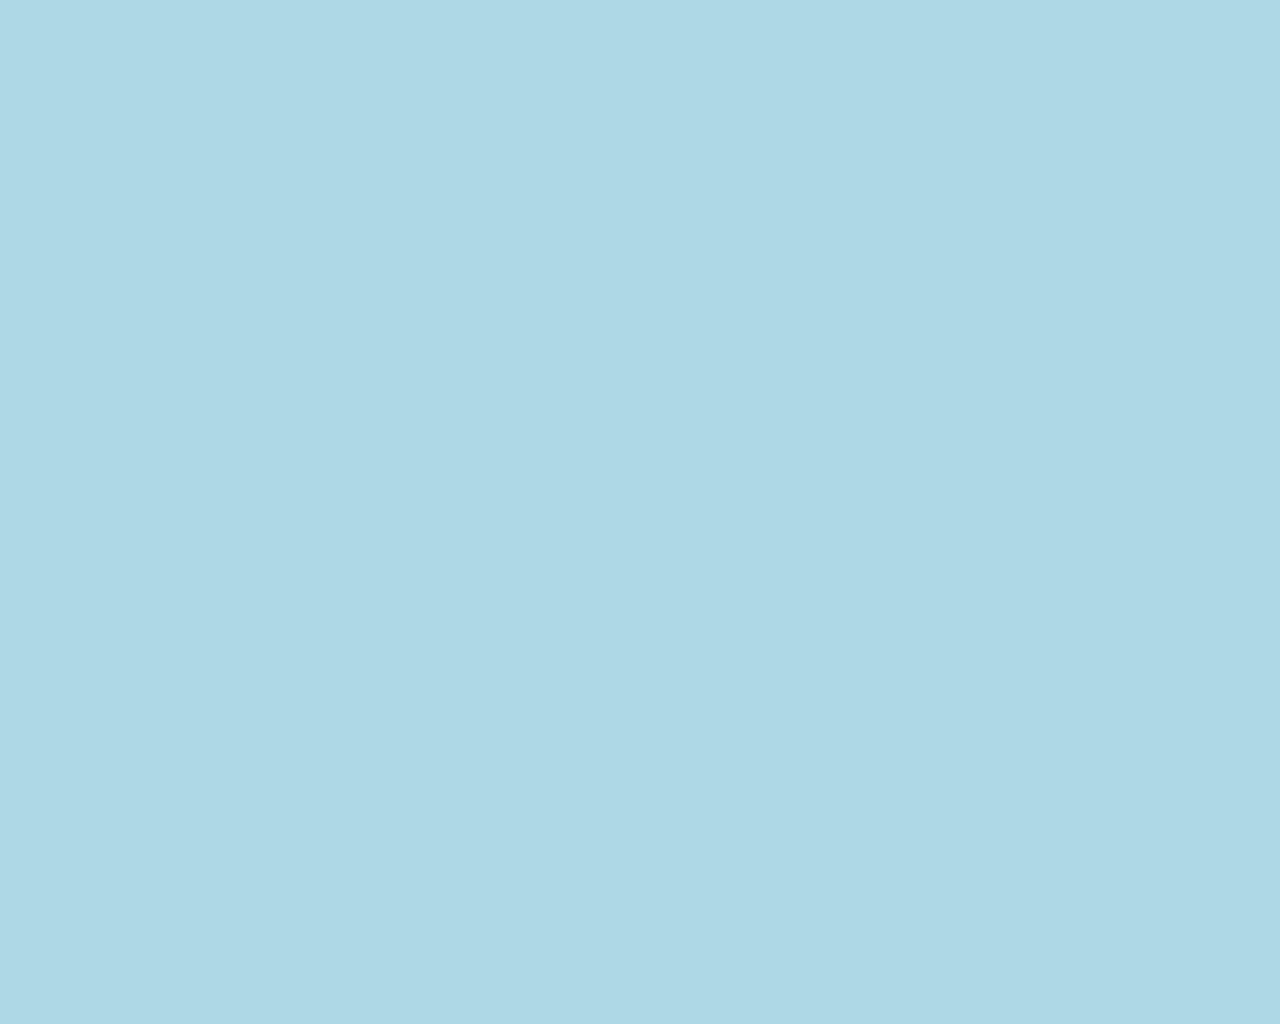 1280x1024 Light Blue Solid Color Background